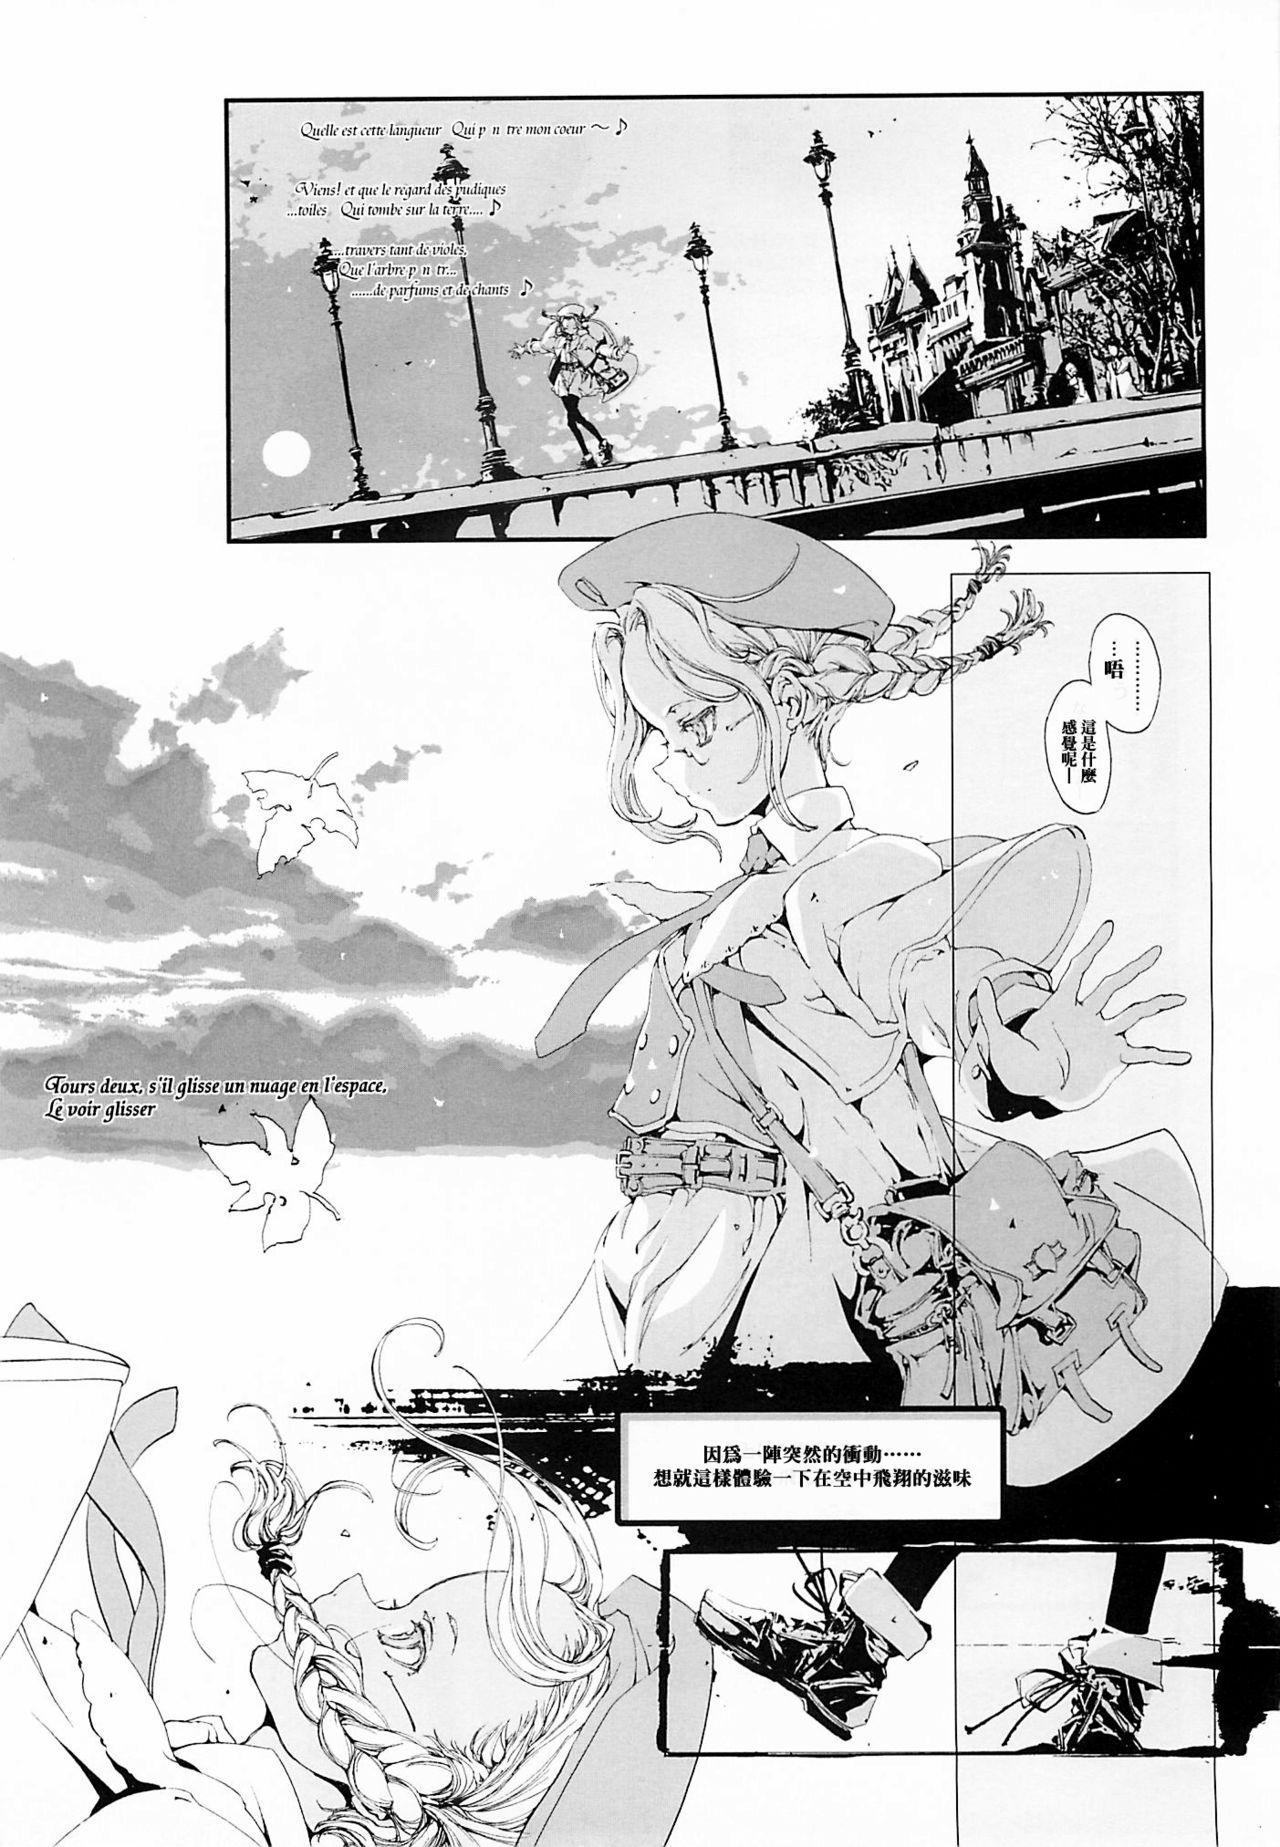 (CR37) [70 Nenshiki Yuukyuu Kikan (Endou Okito)] ORGAN-Tino  01-02[Chinese] [拾荒者汉化组] [Incomplete] 23